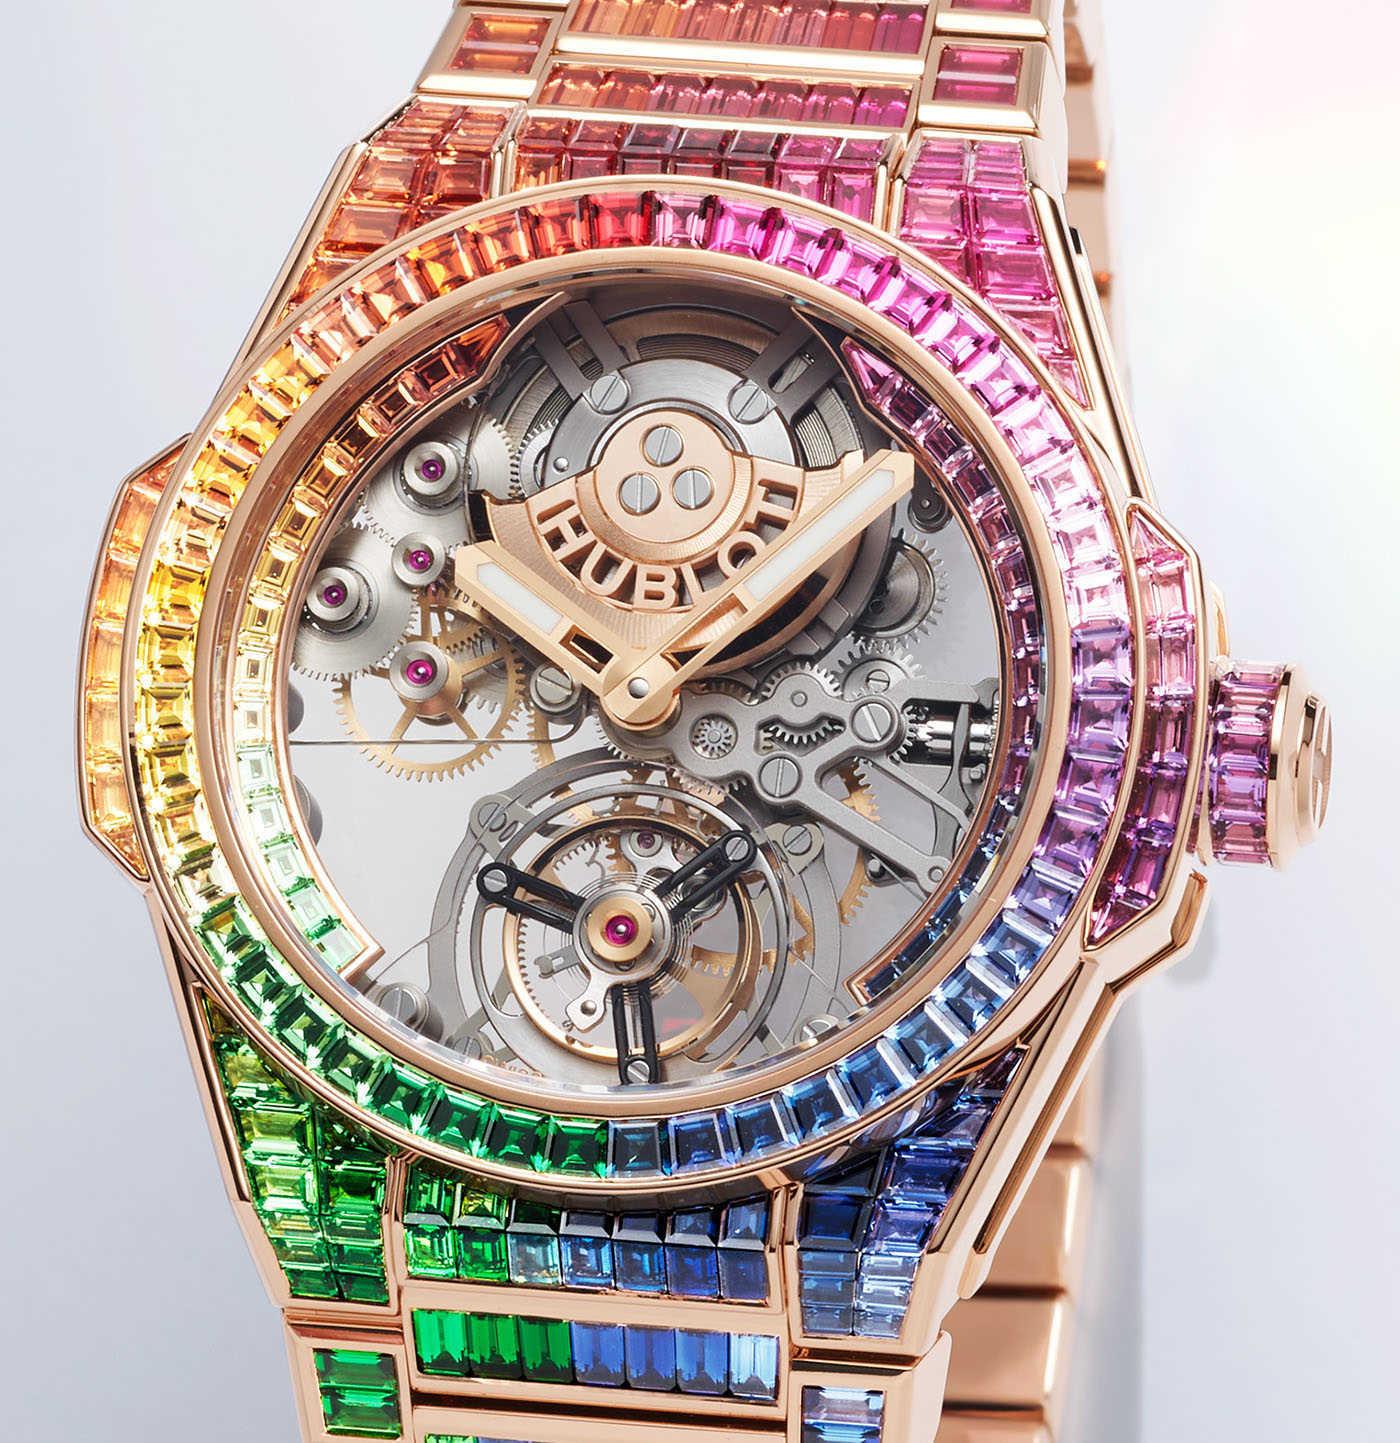 Hublot представляет часы Big Bang Integral Tourbillon Rainbow